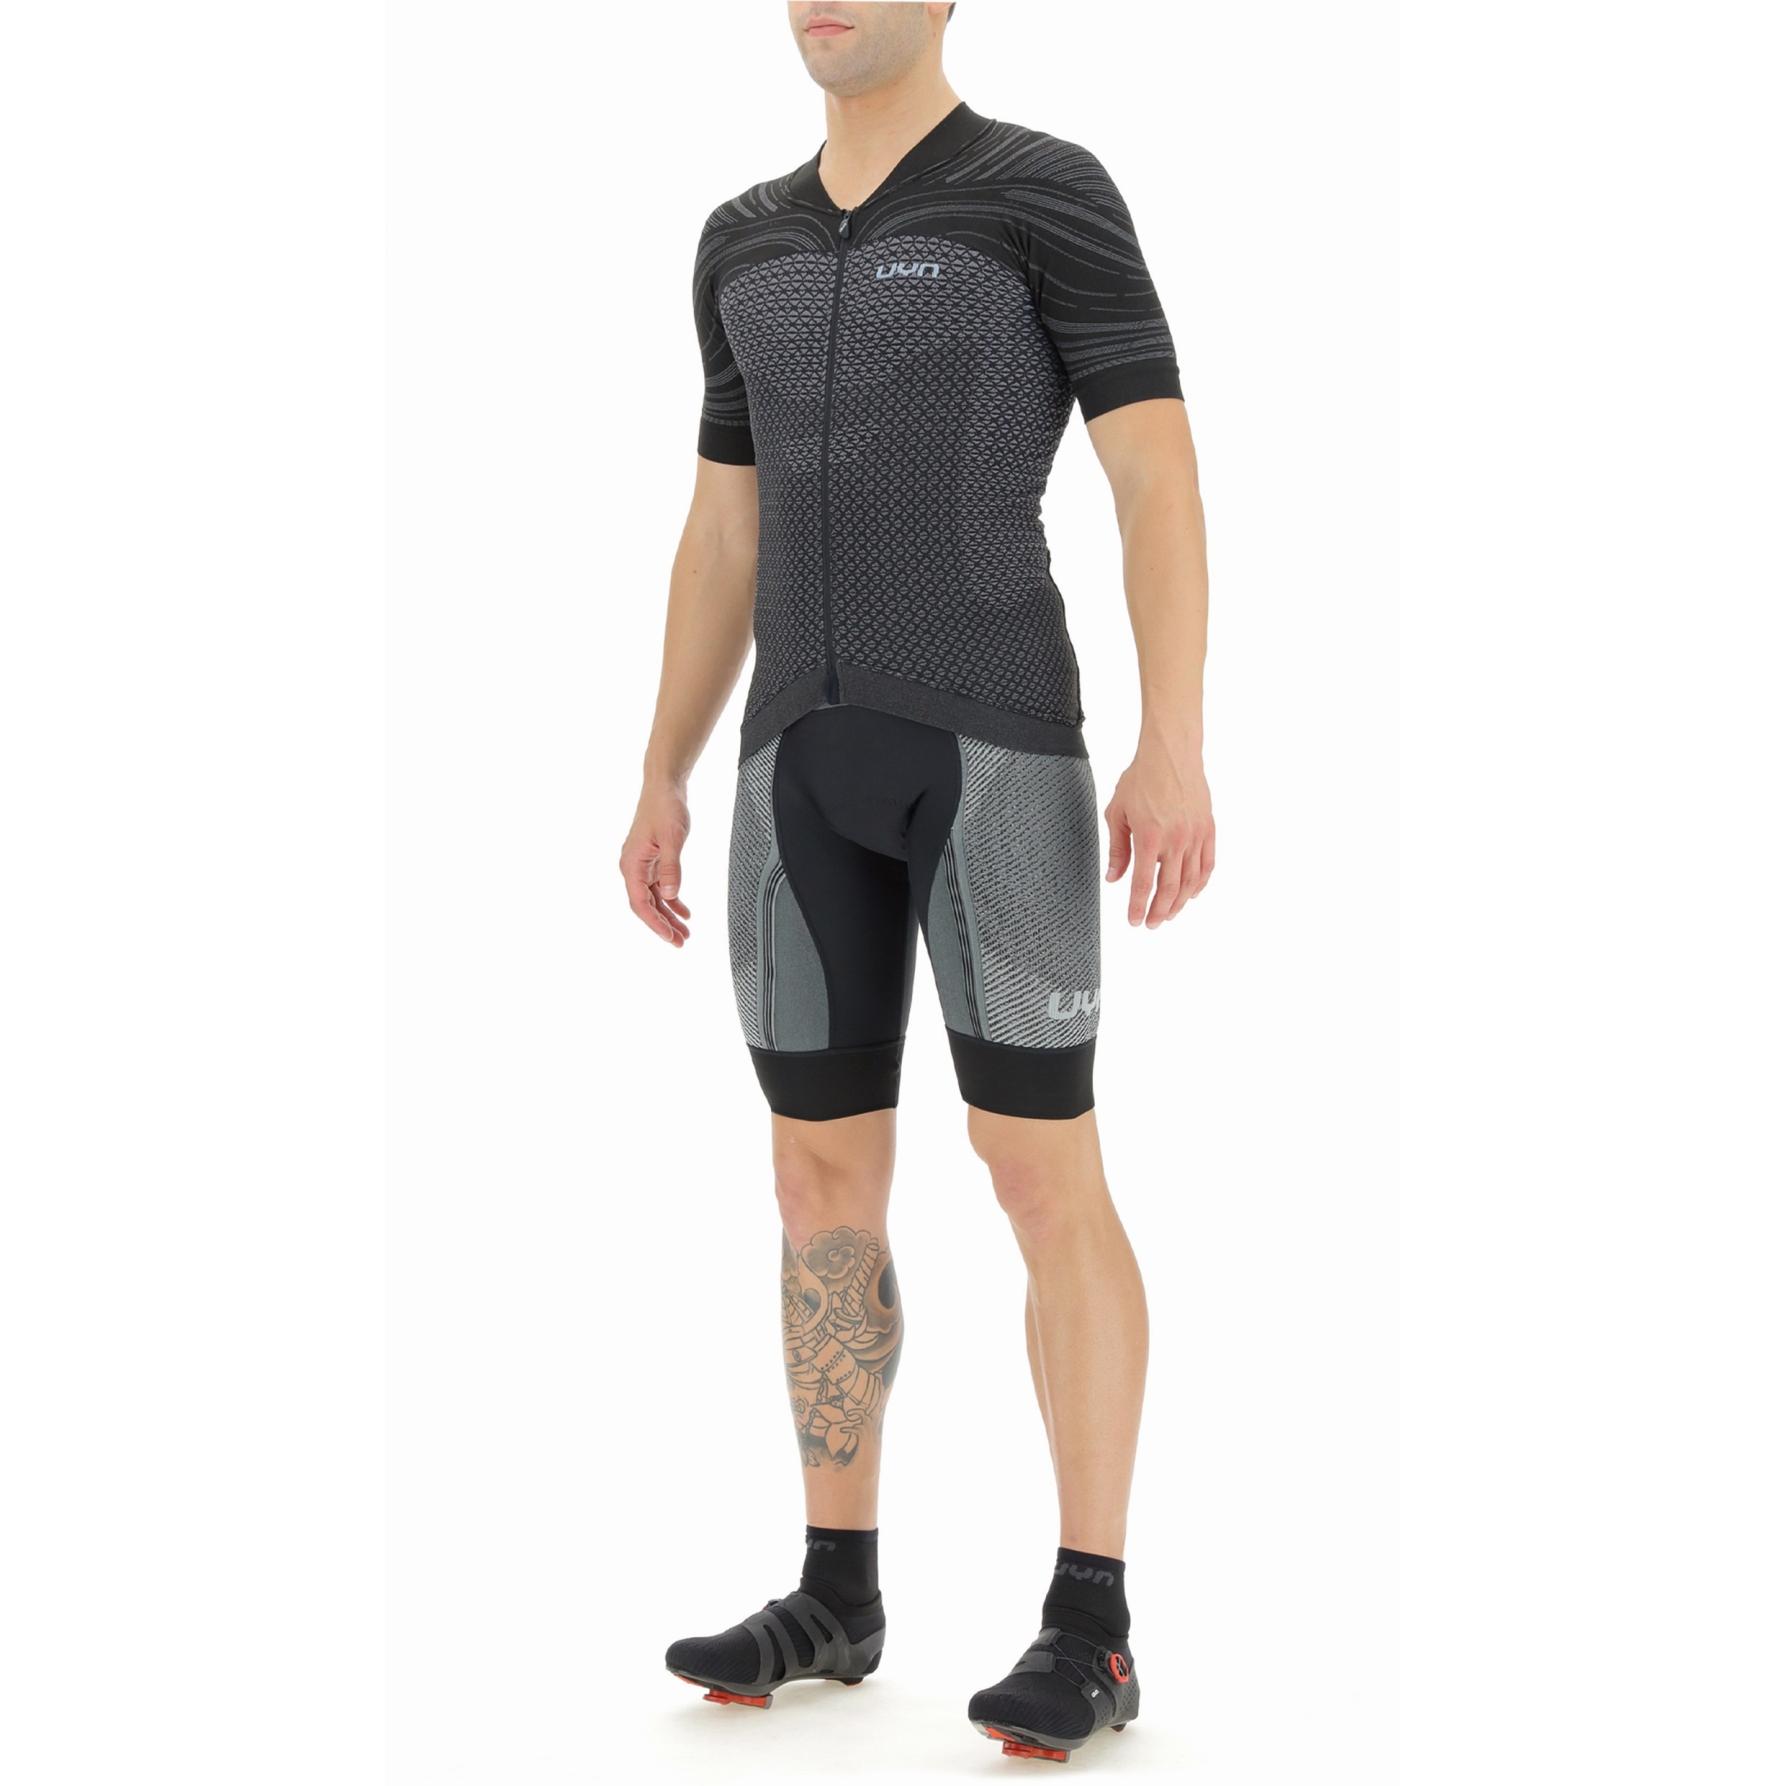 Bild von UYN Biking Coolboost T-Shirt - Bullet/Jet Black